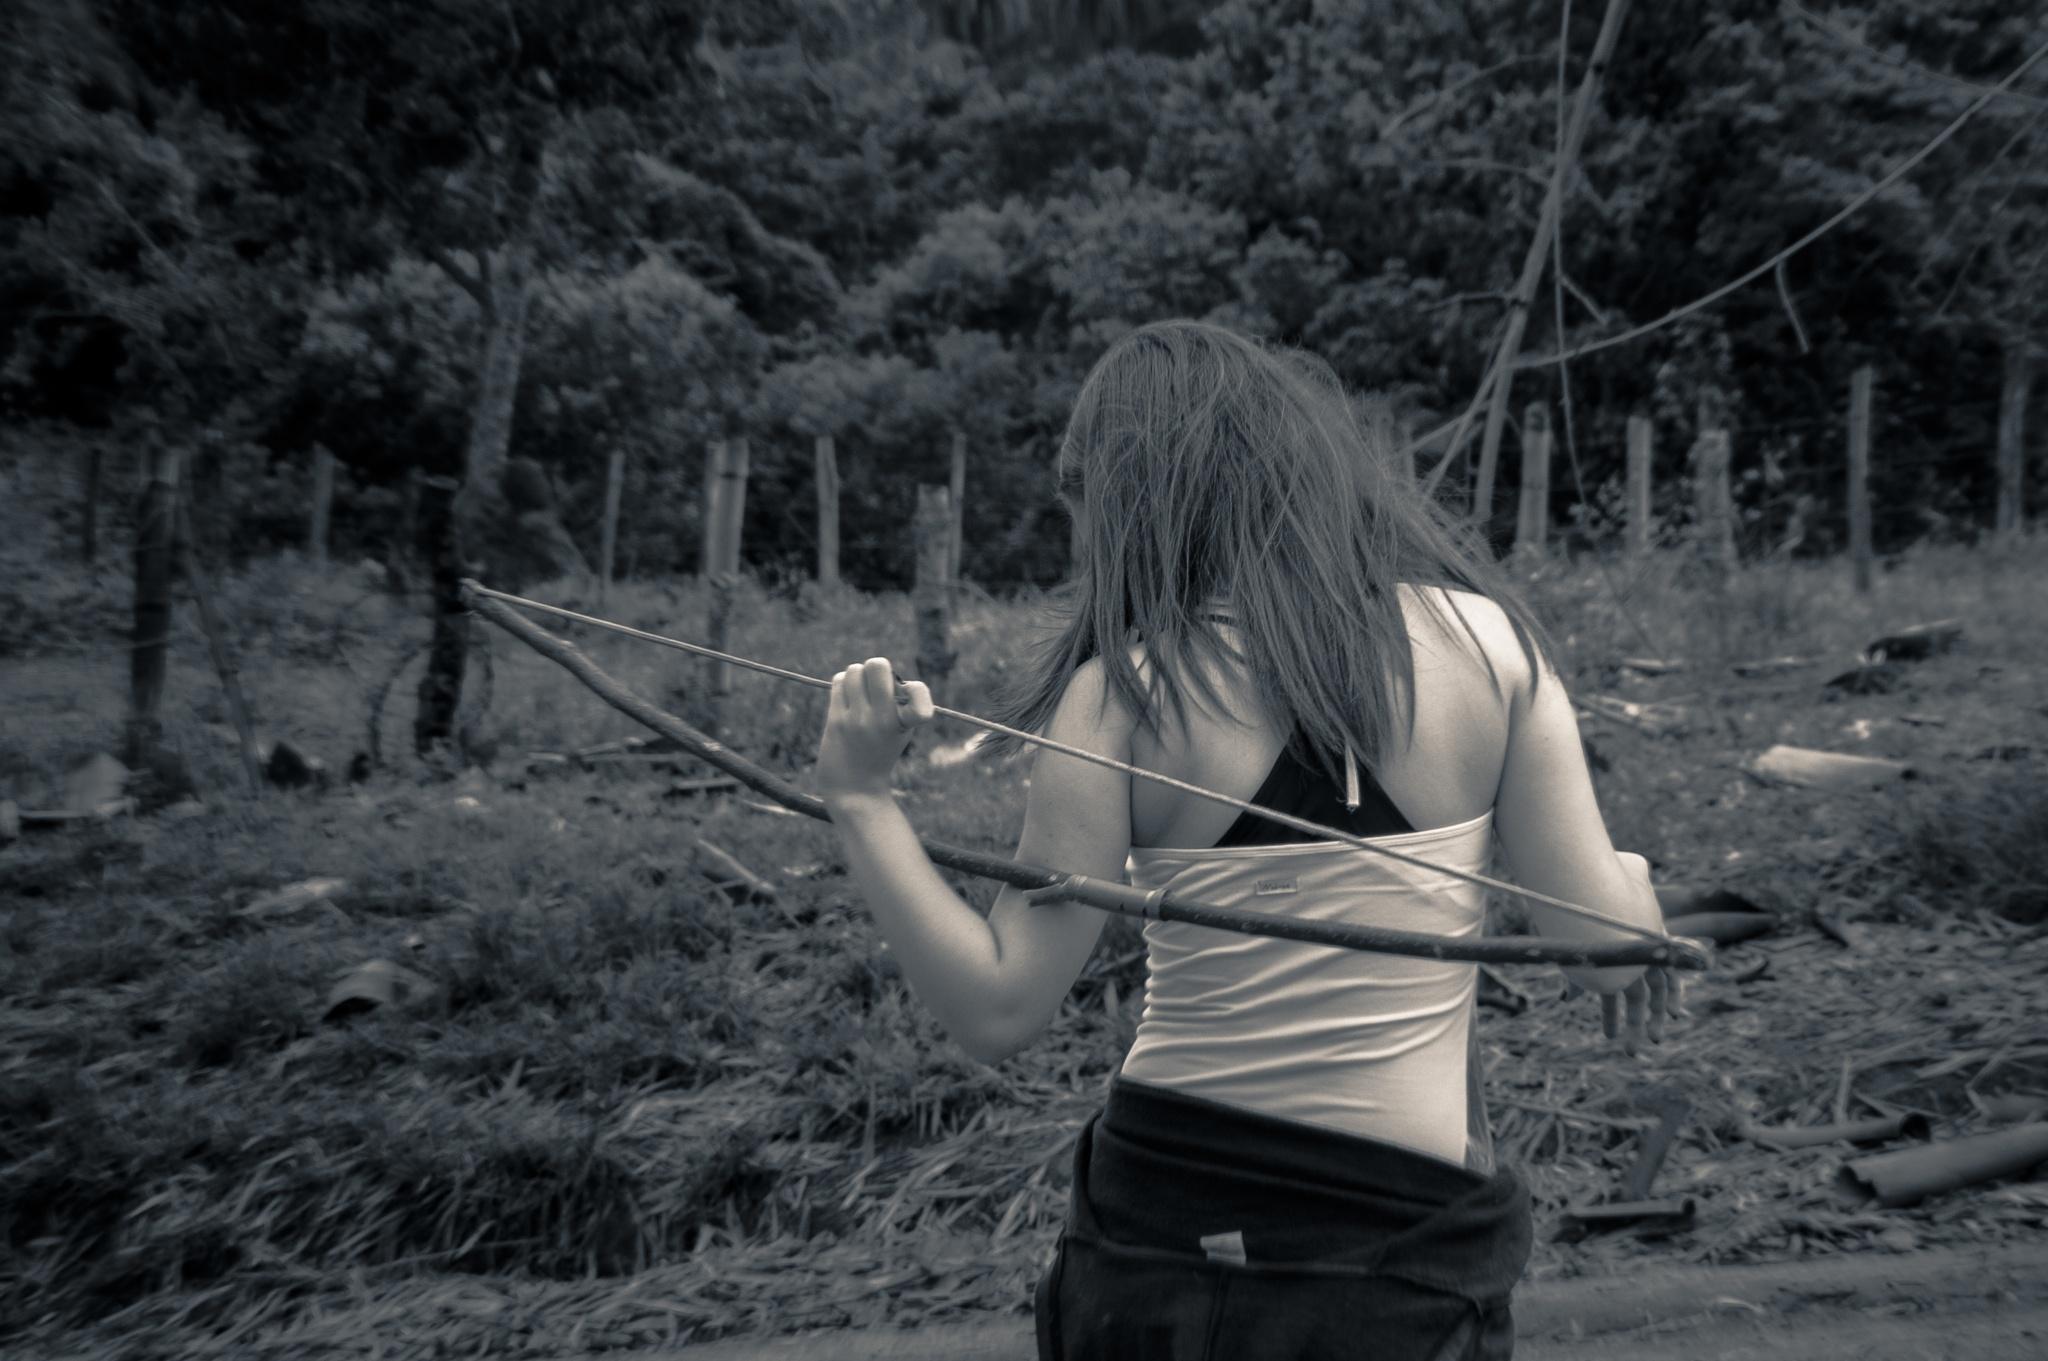 Brenda com arco e flecha... by Idanir Pawelkiewicz